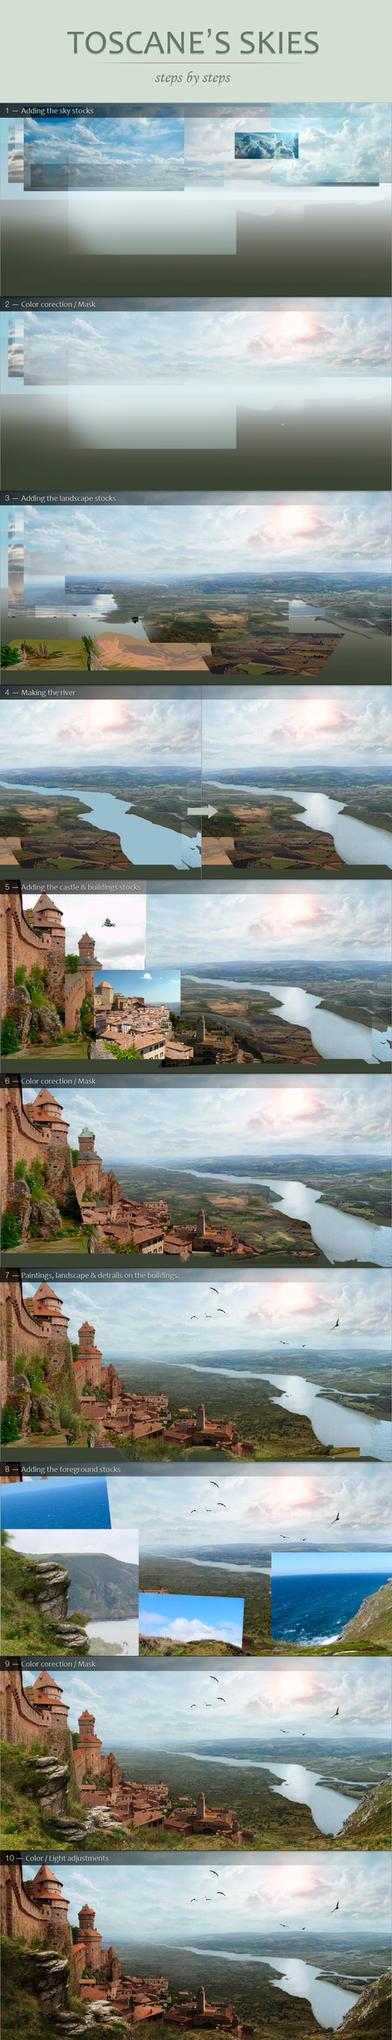 Steps by steps: Toscane by Tony-ob